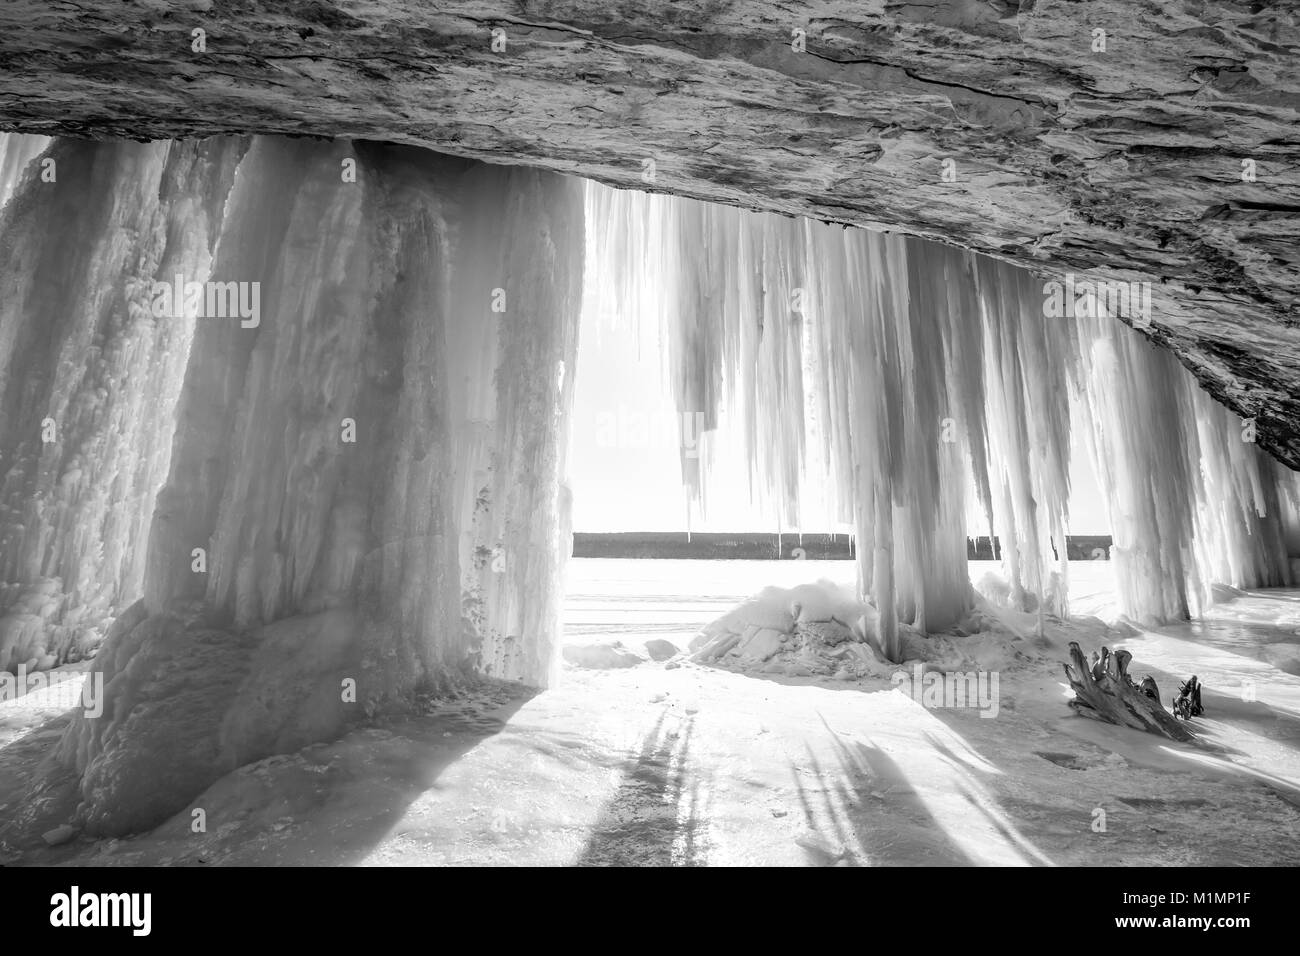 A sun burst shines around an ice column curtain on Grand Island near Munising Michigan in winter - Stock Image